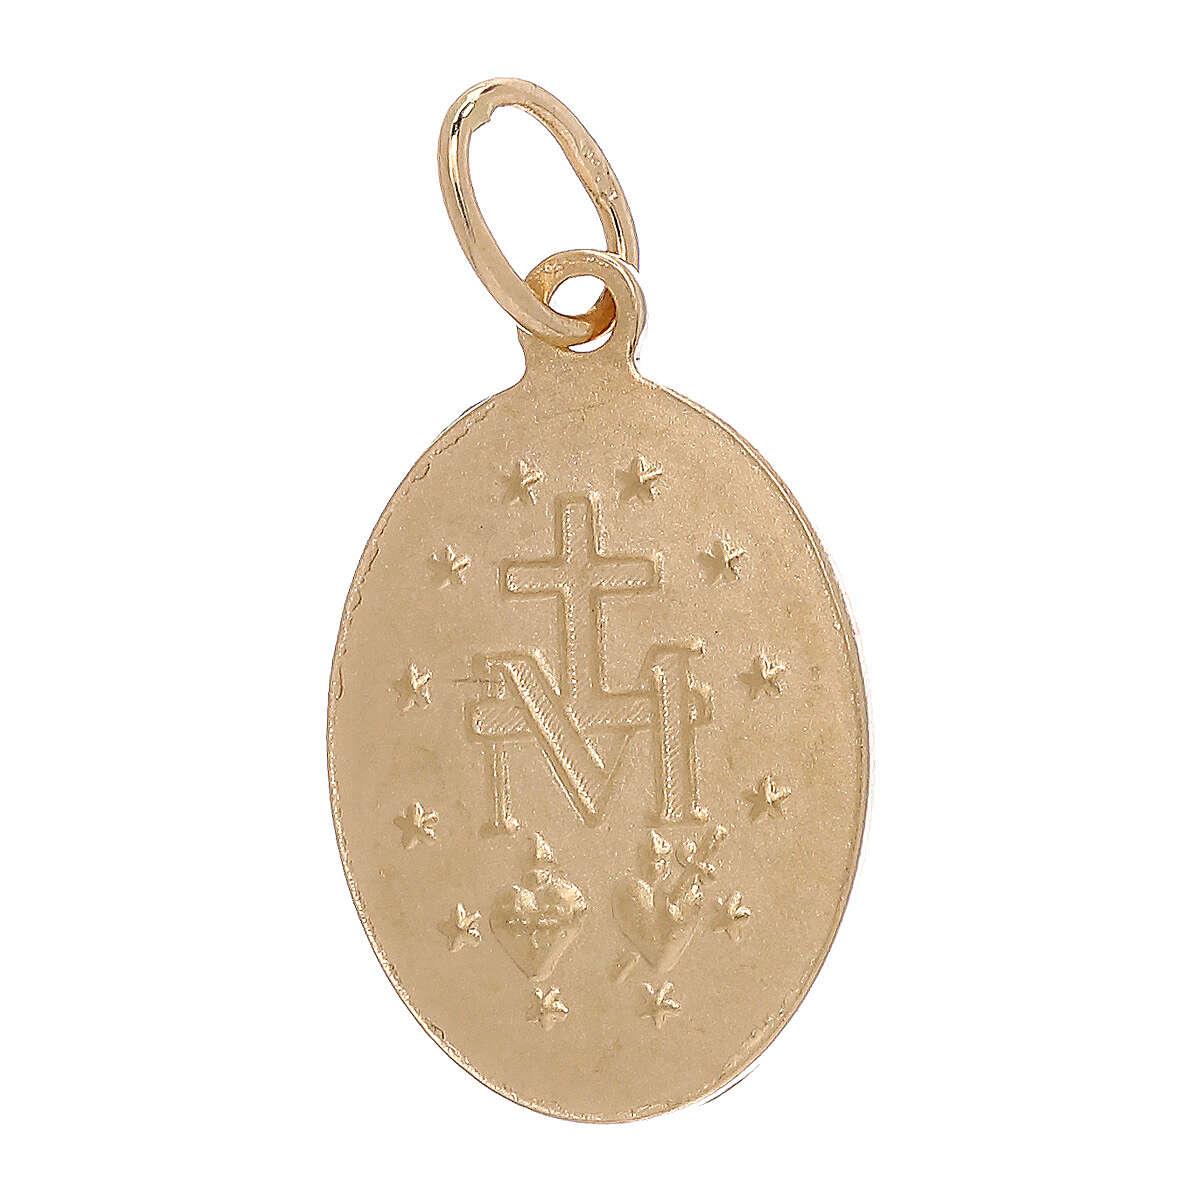 Colgante Medalla Milagrosa oro amarillo 18 quilates 1,8 gramos 4